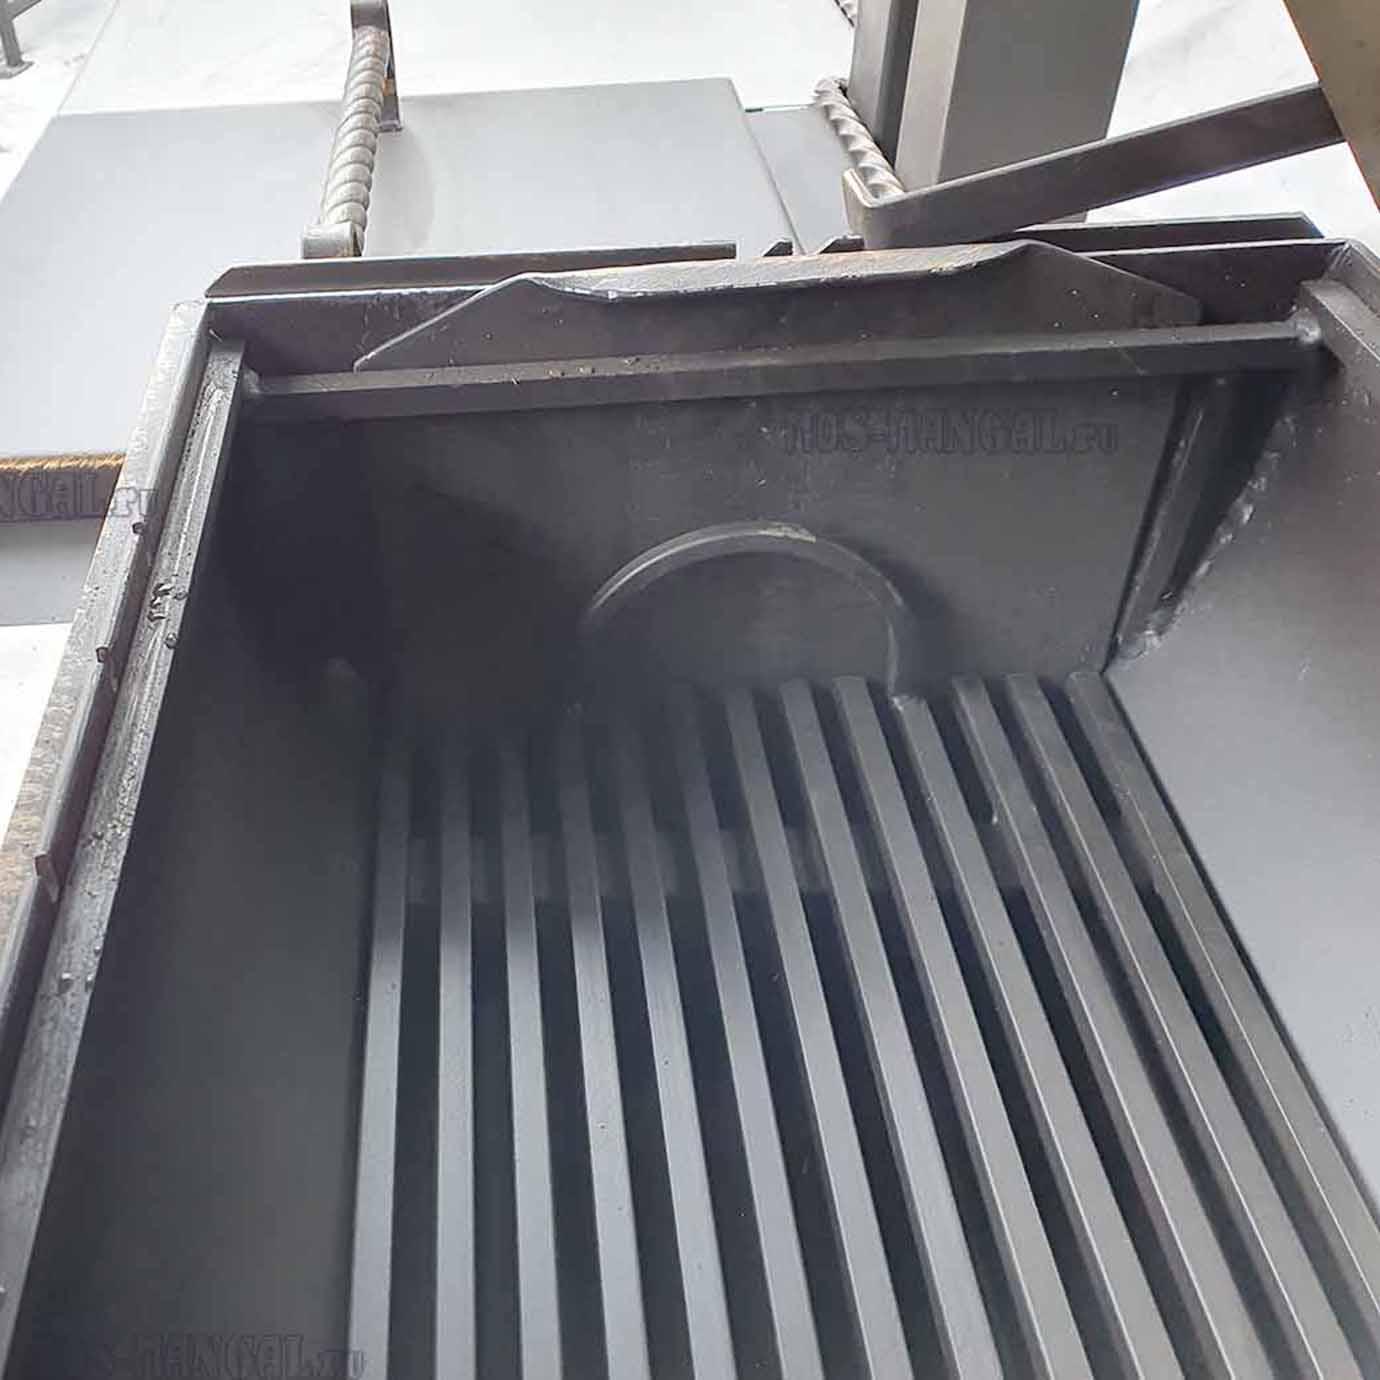 жаровня мангала Шарм-эль-Шейх BBQ